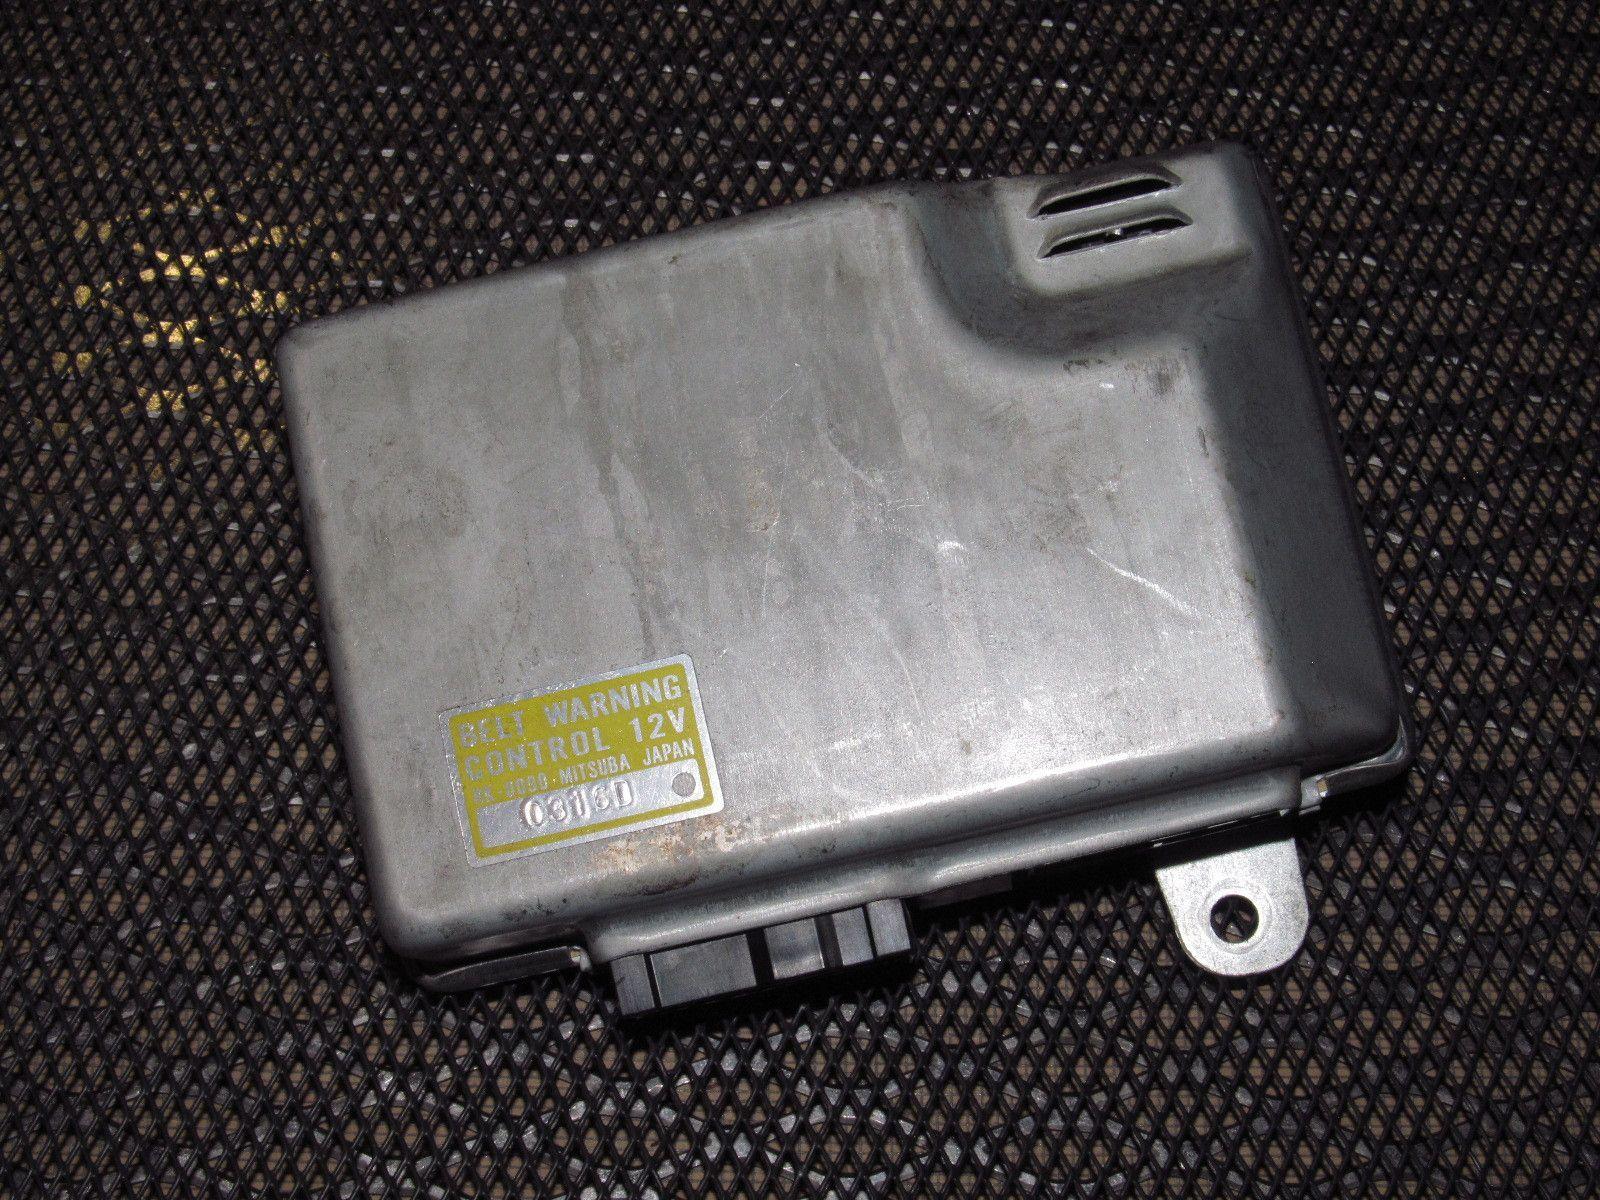 90 91 92 93 acura integra oem belt warning control rk 0090